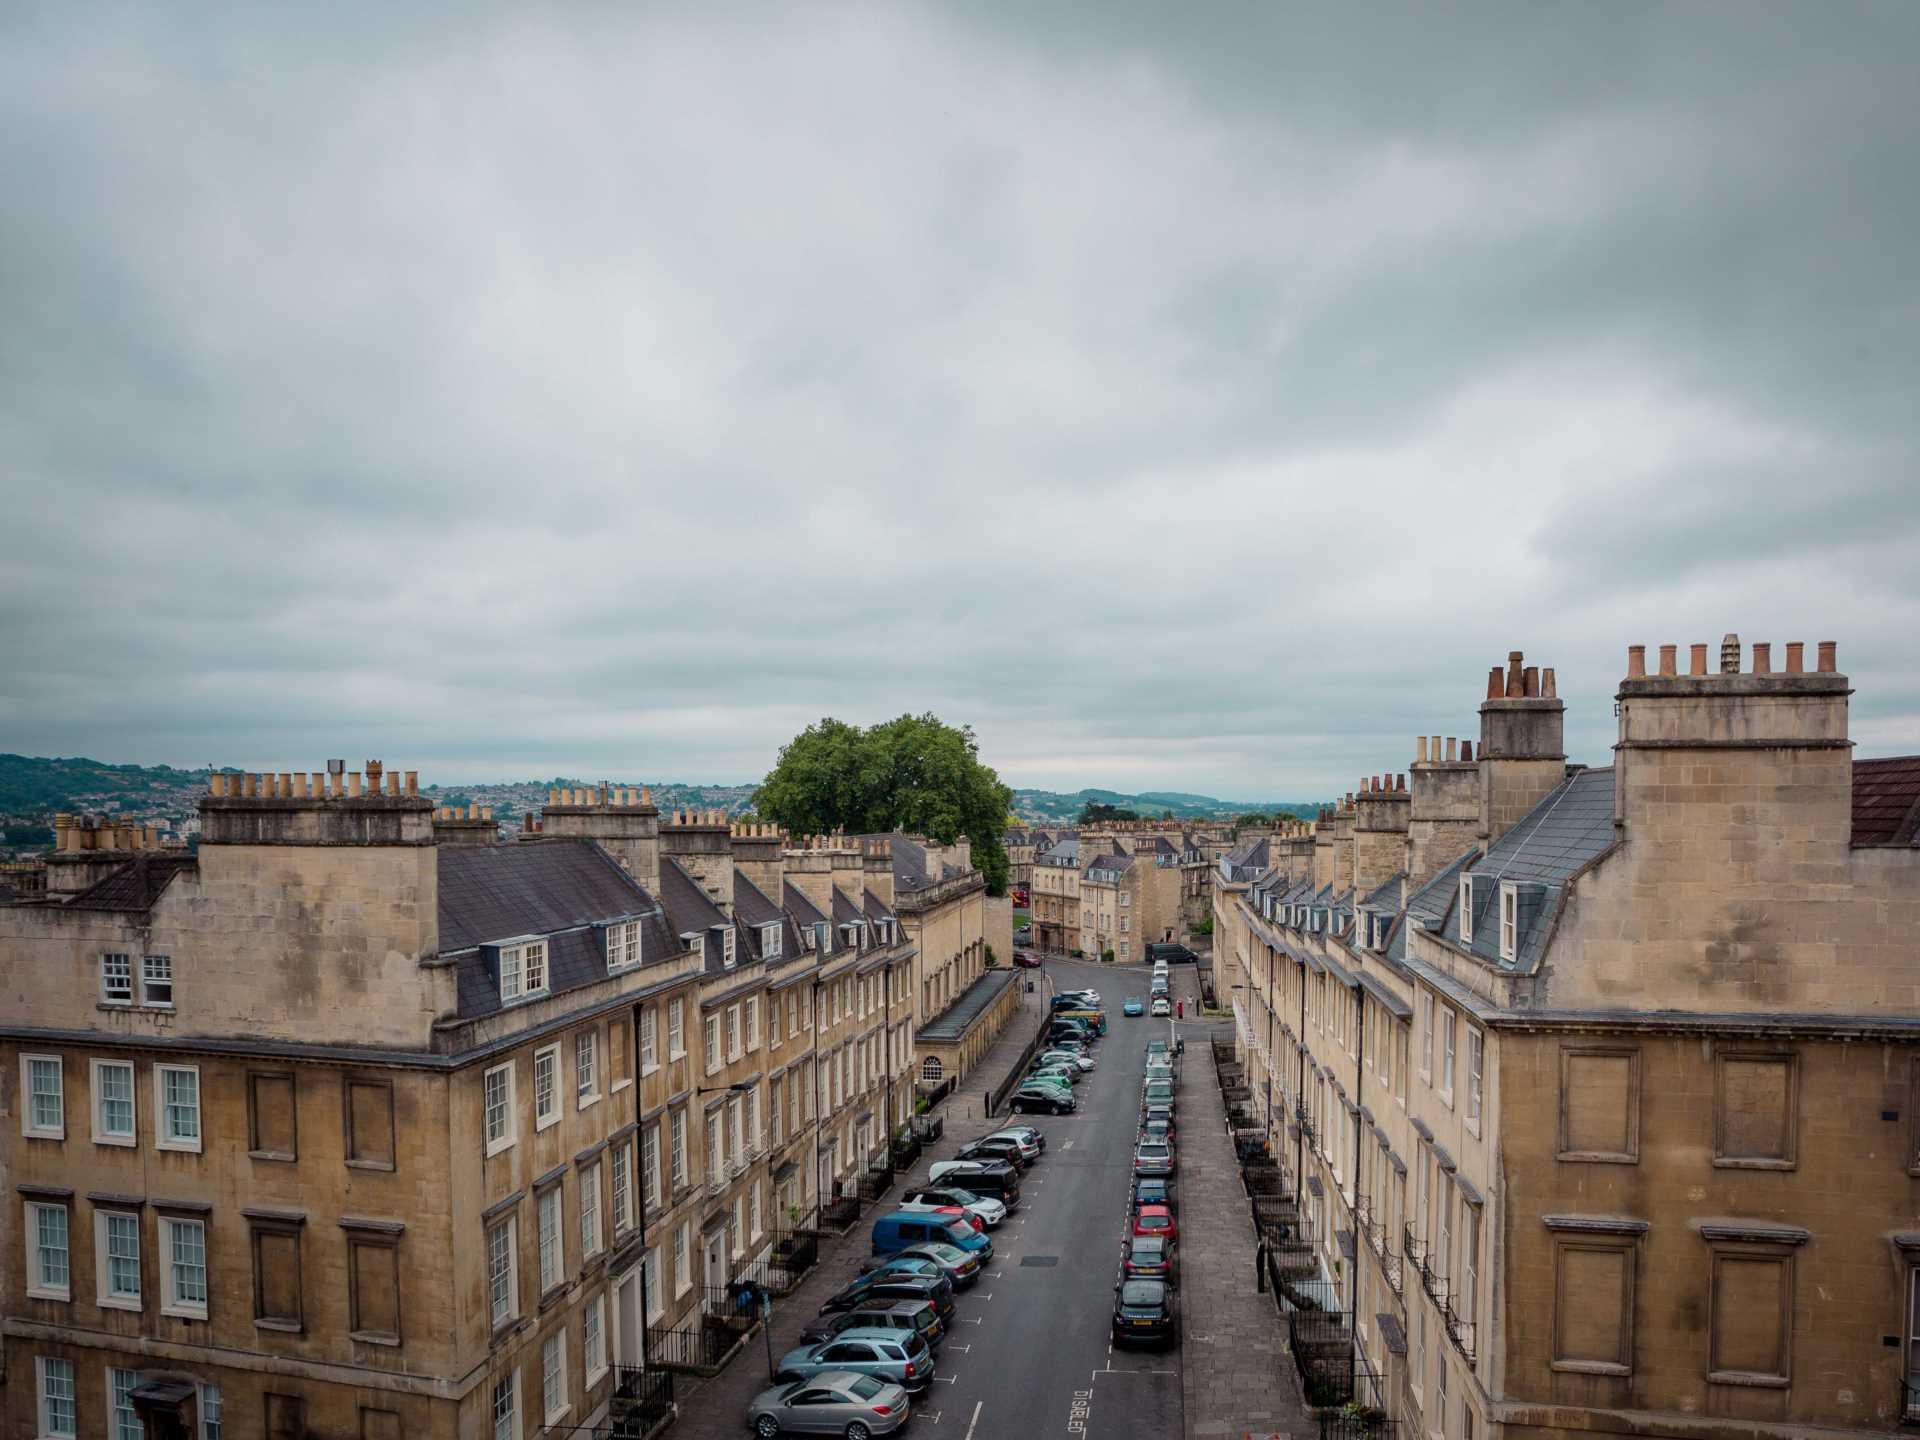 Belmont, Bath, Image 7